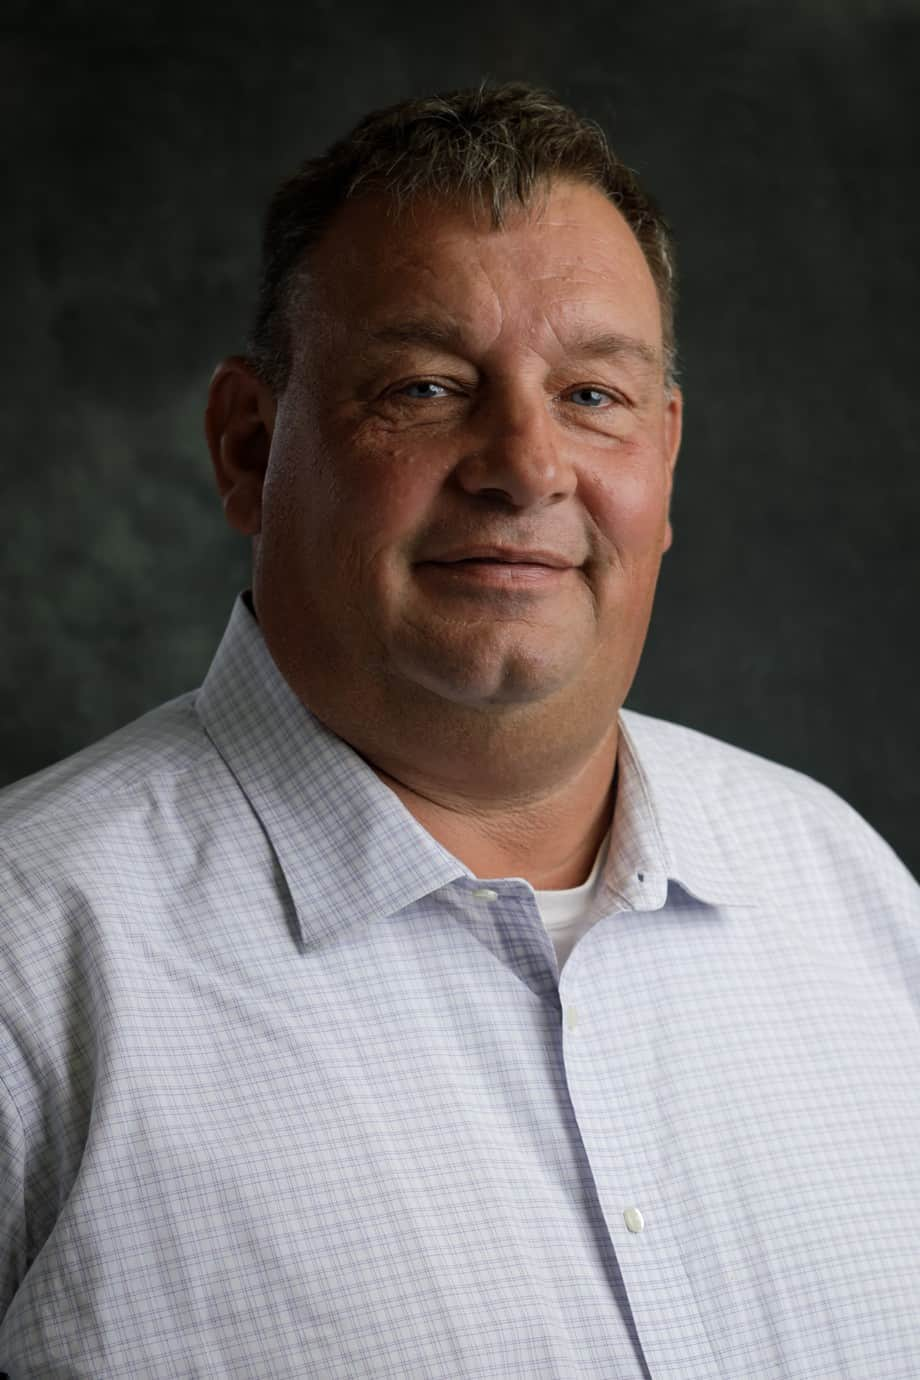 Dean Slaby - President